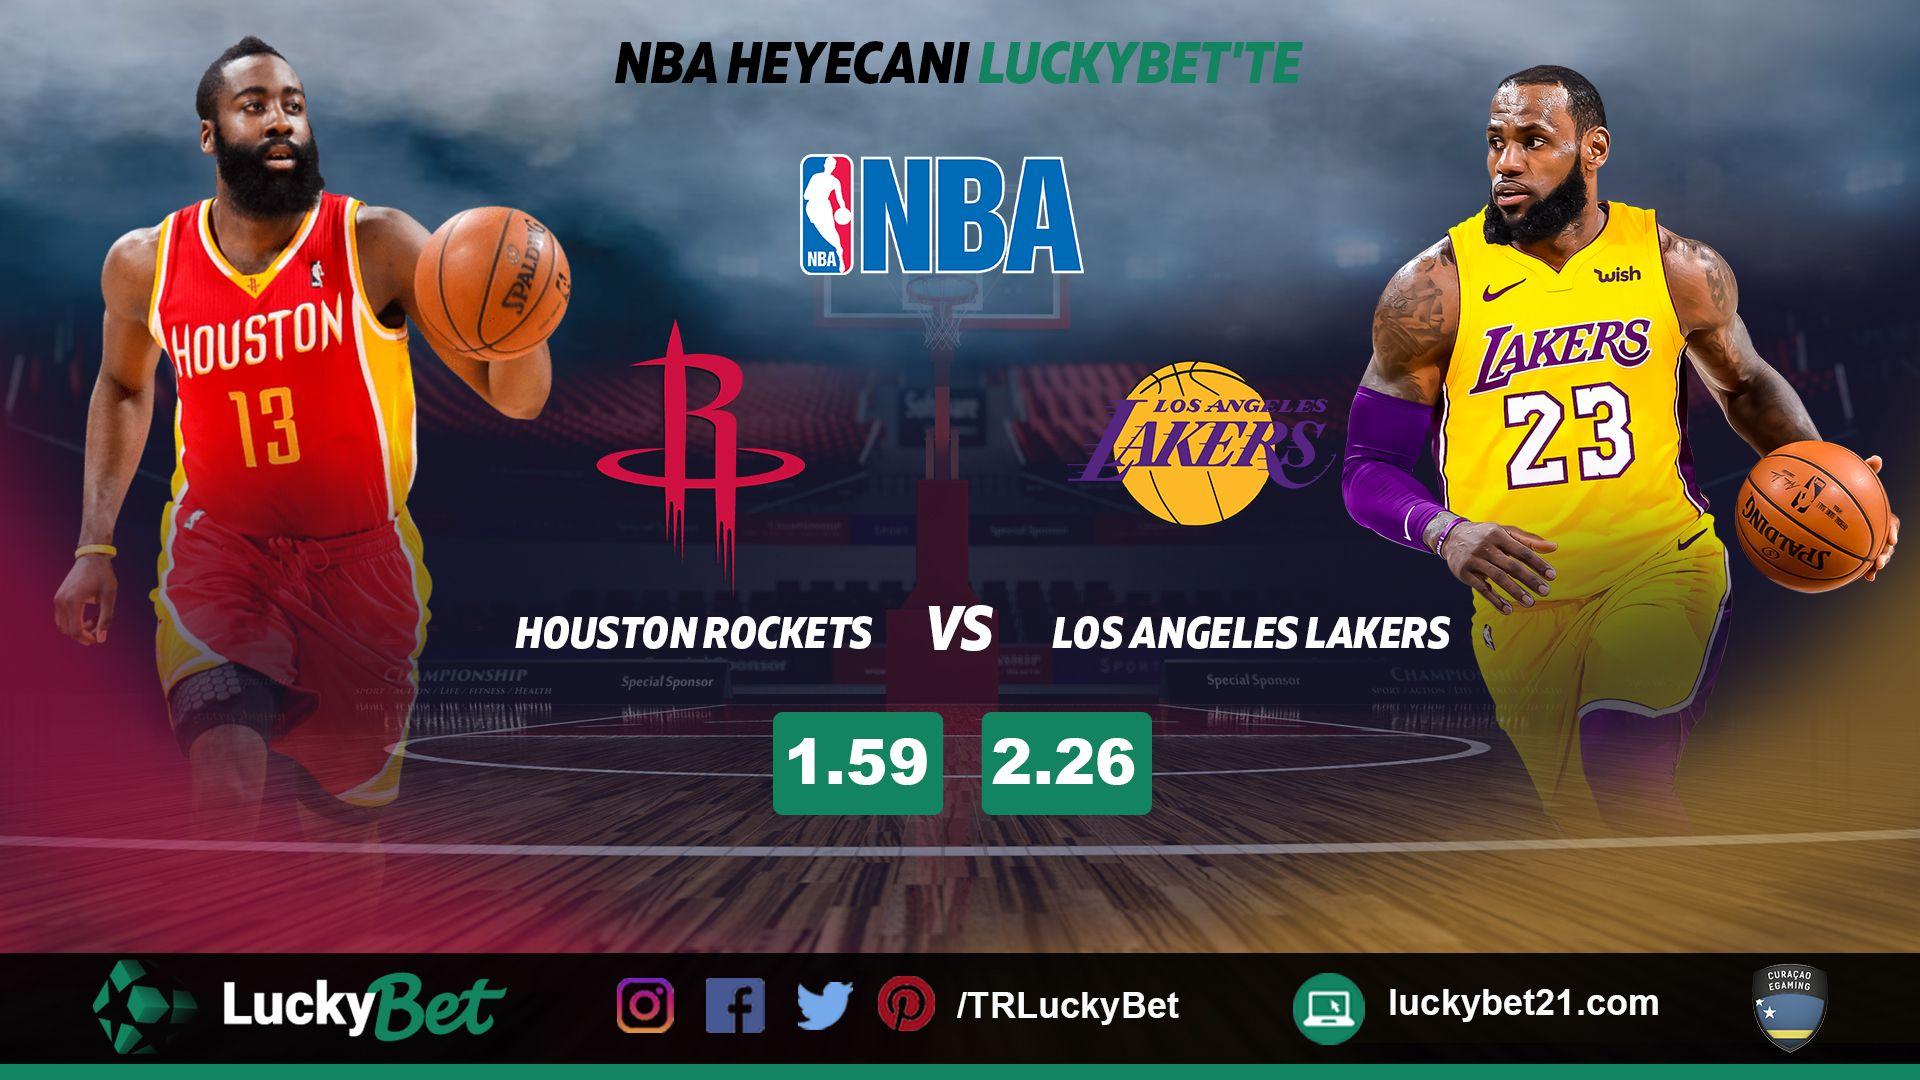 Nba Basketbol Liginde Gecenin Maci Houstonrockets Lakers Http Luckybet21 Com Sansa Inananlarin Canli Bahis Ve Casino Si Houston Rockets Nba Mac